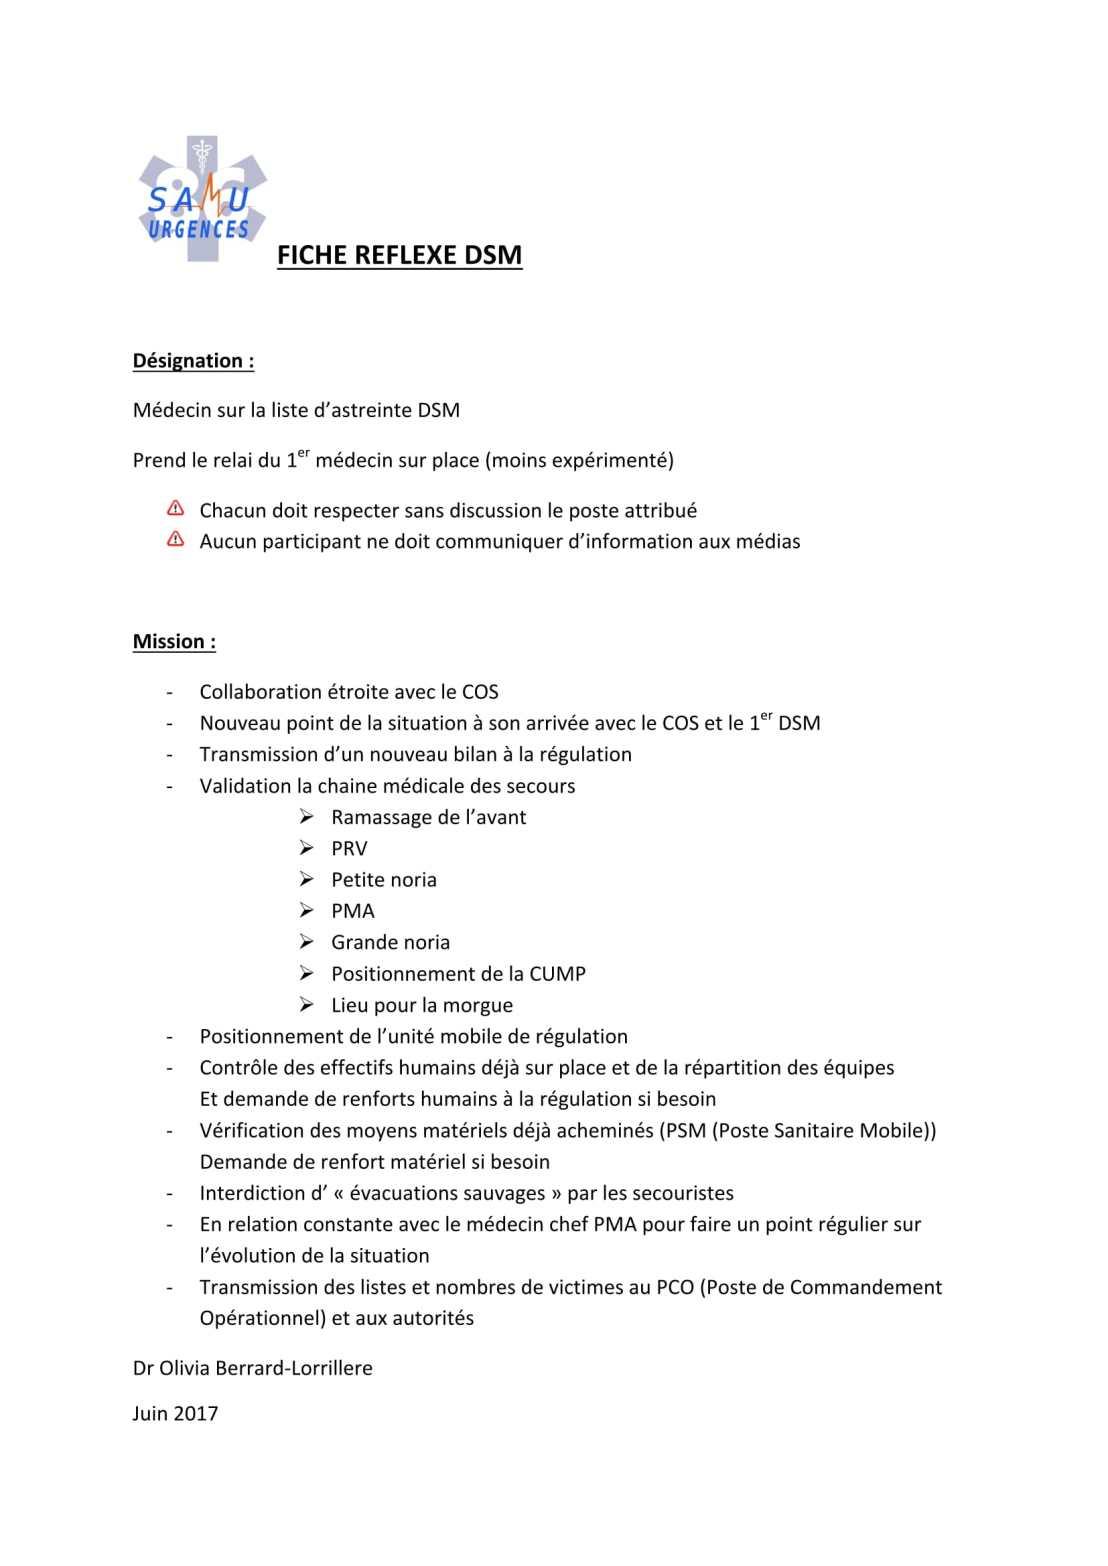 reflexe2_DSM-1